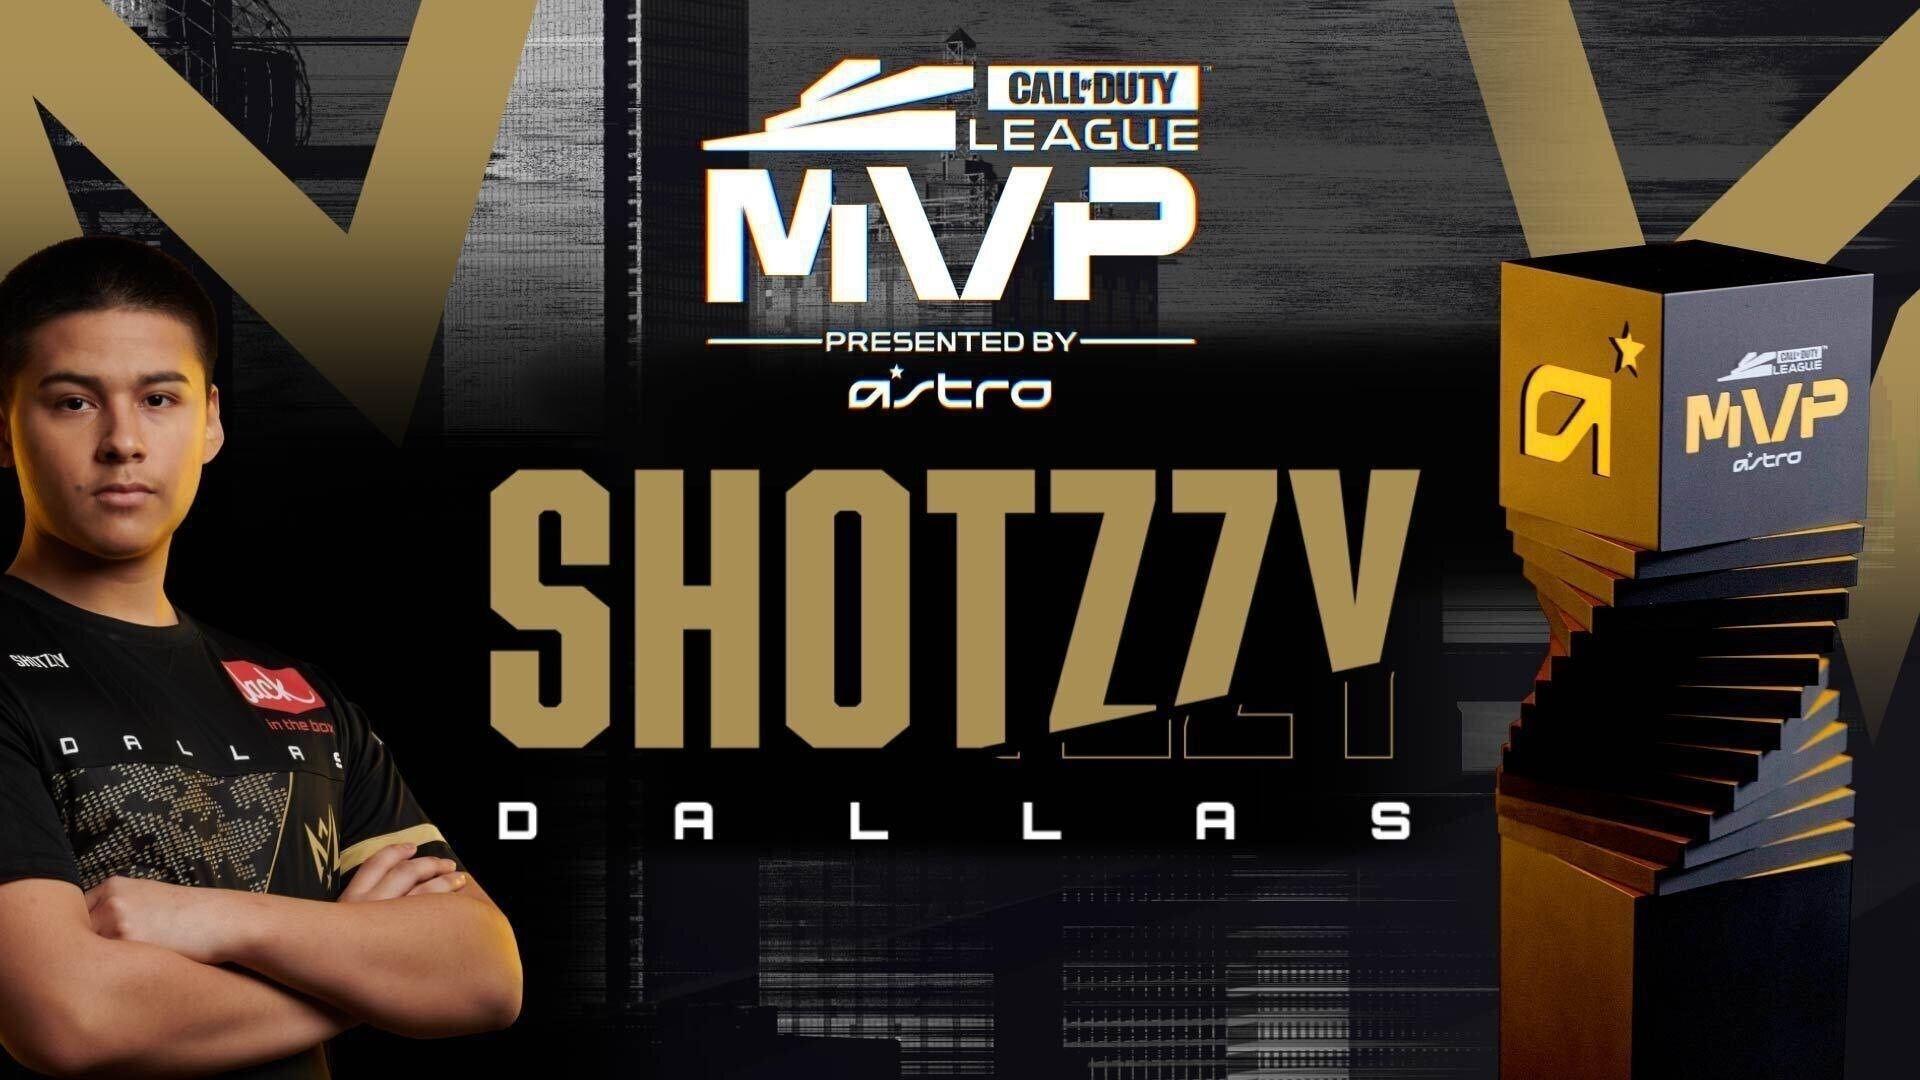 call of duty league 2020 mvp shotzzy